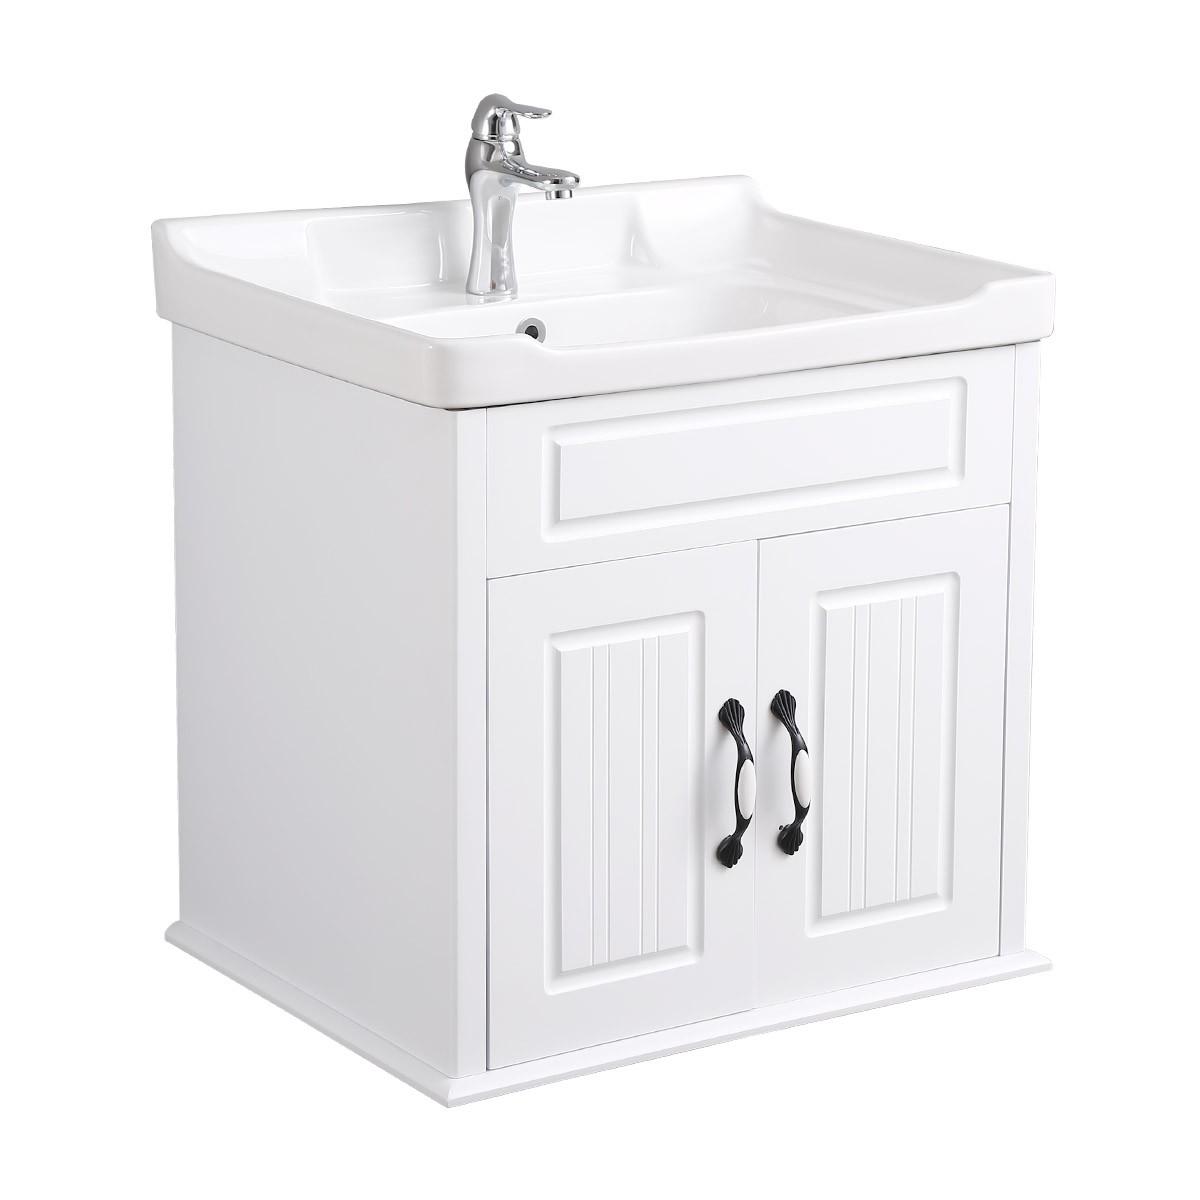 Bathroom Sink Cabinet Wall Mount White MDF KD Package